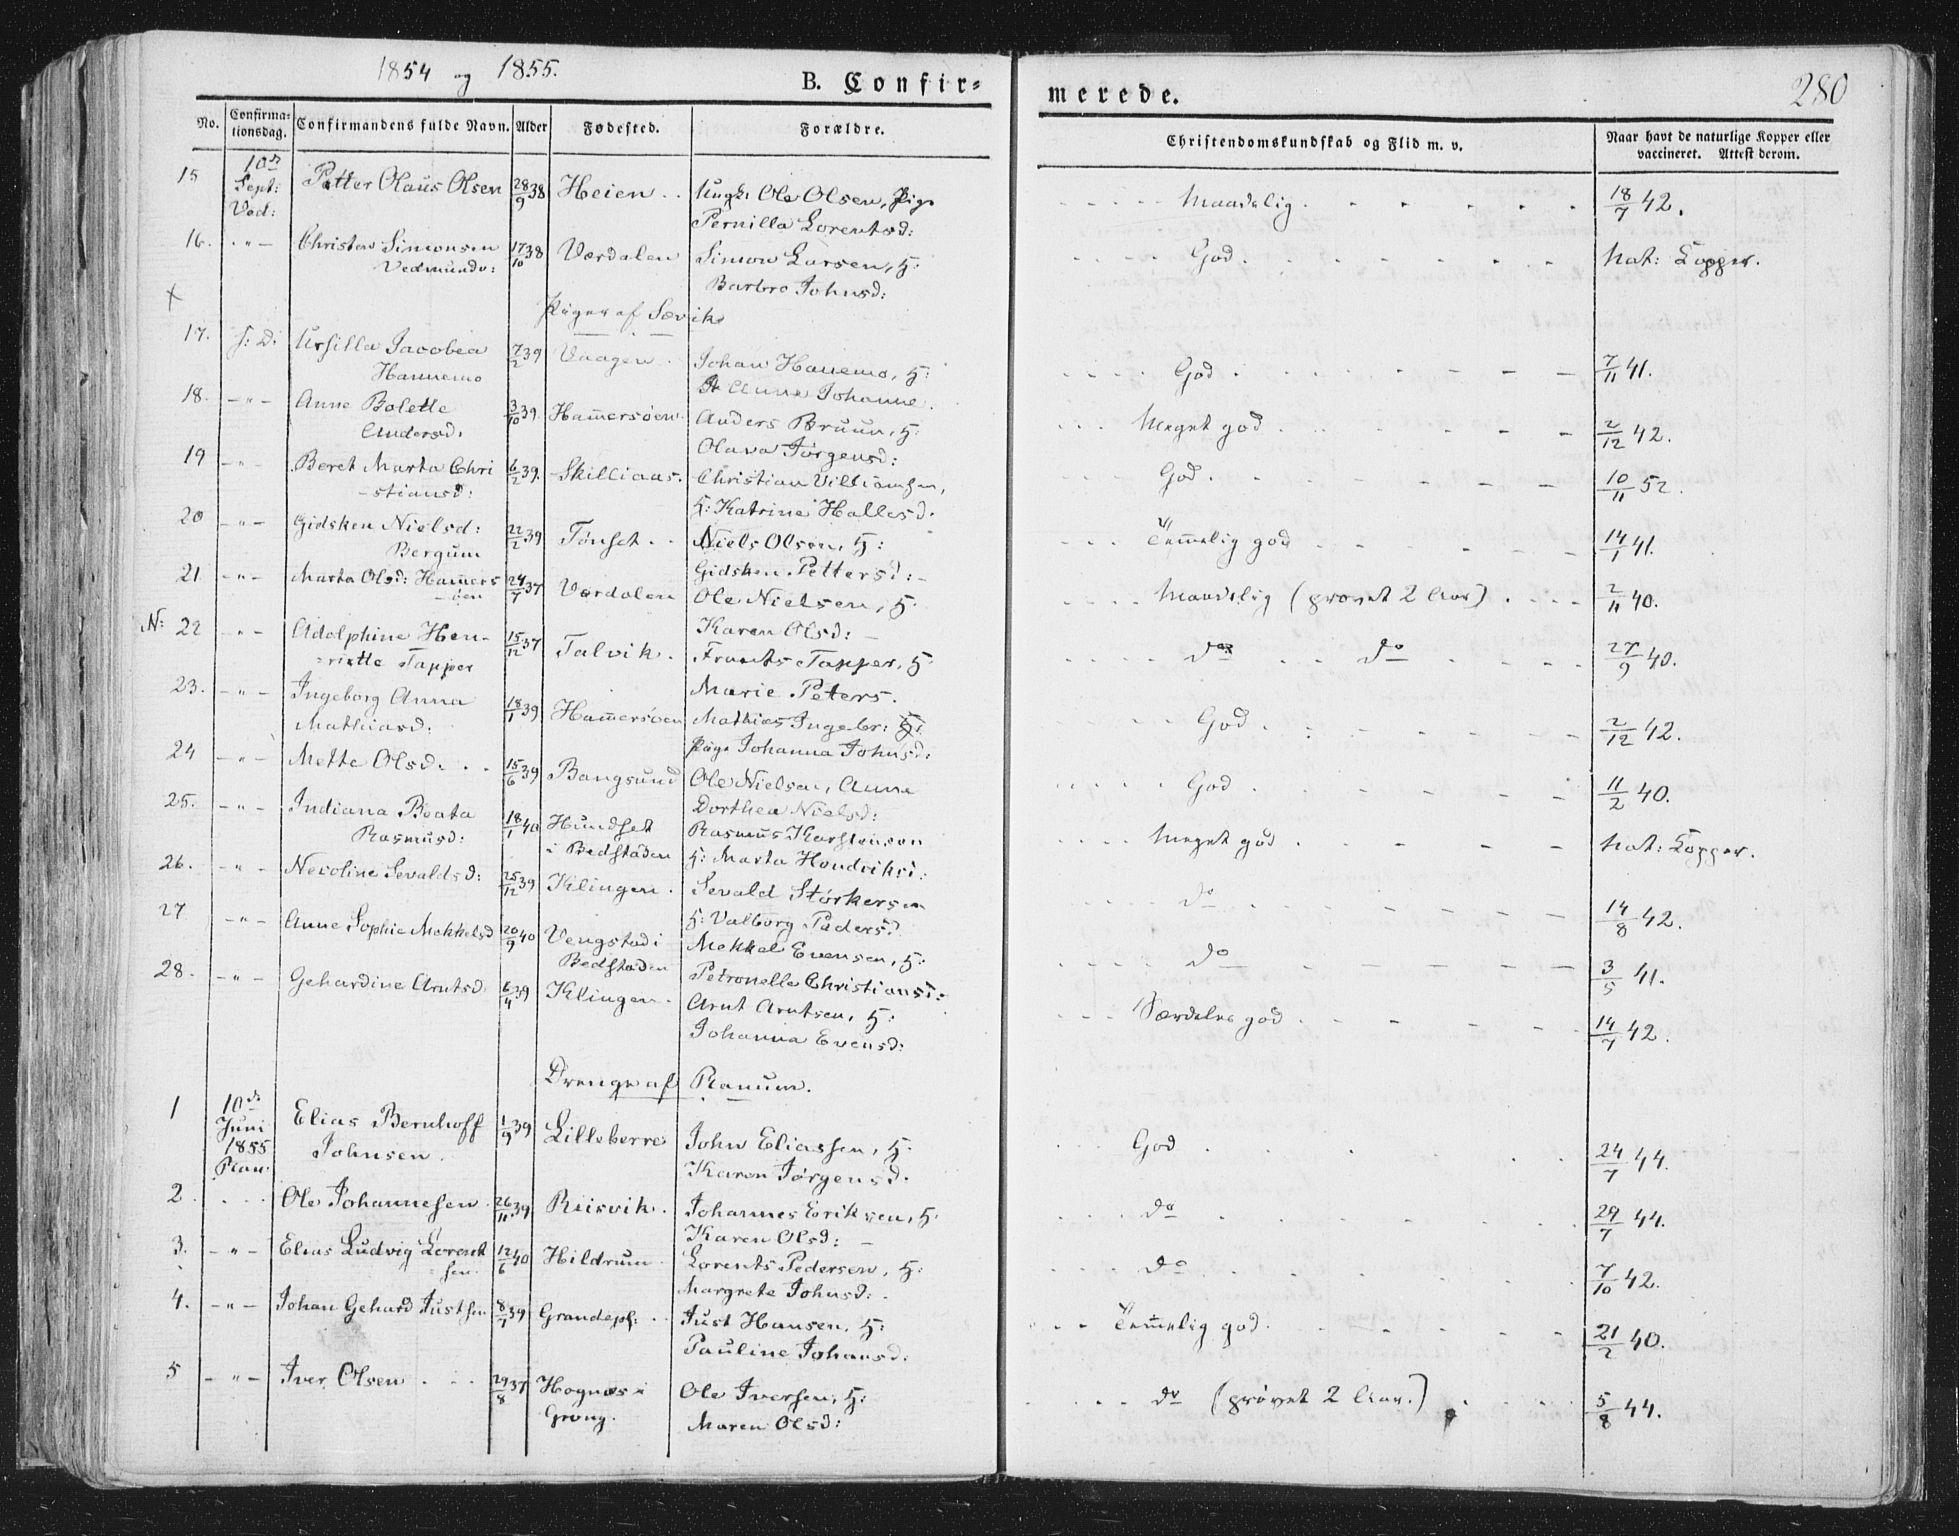 SAT, Ministerialprotokoller, klokkerbøker og fødselsregistre - Nord-Trøndelag, 764/L0551: Ministerialbok nr. 764A07a, 1824-1864, s. 280